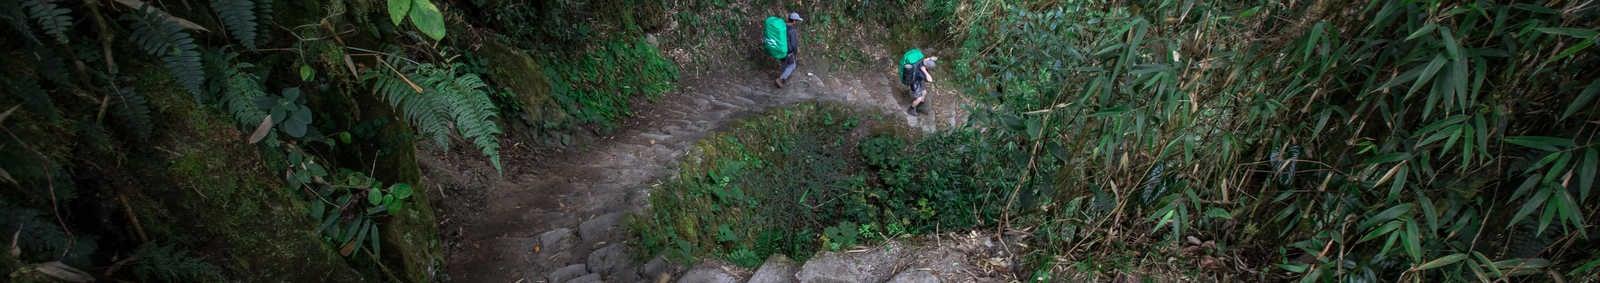 Exodus Porters on the Inca Trail